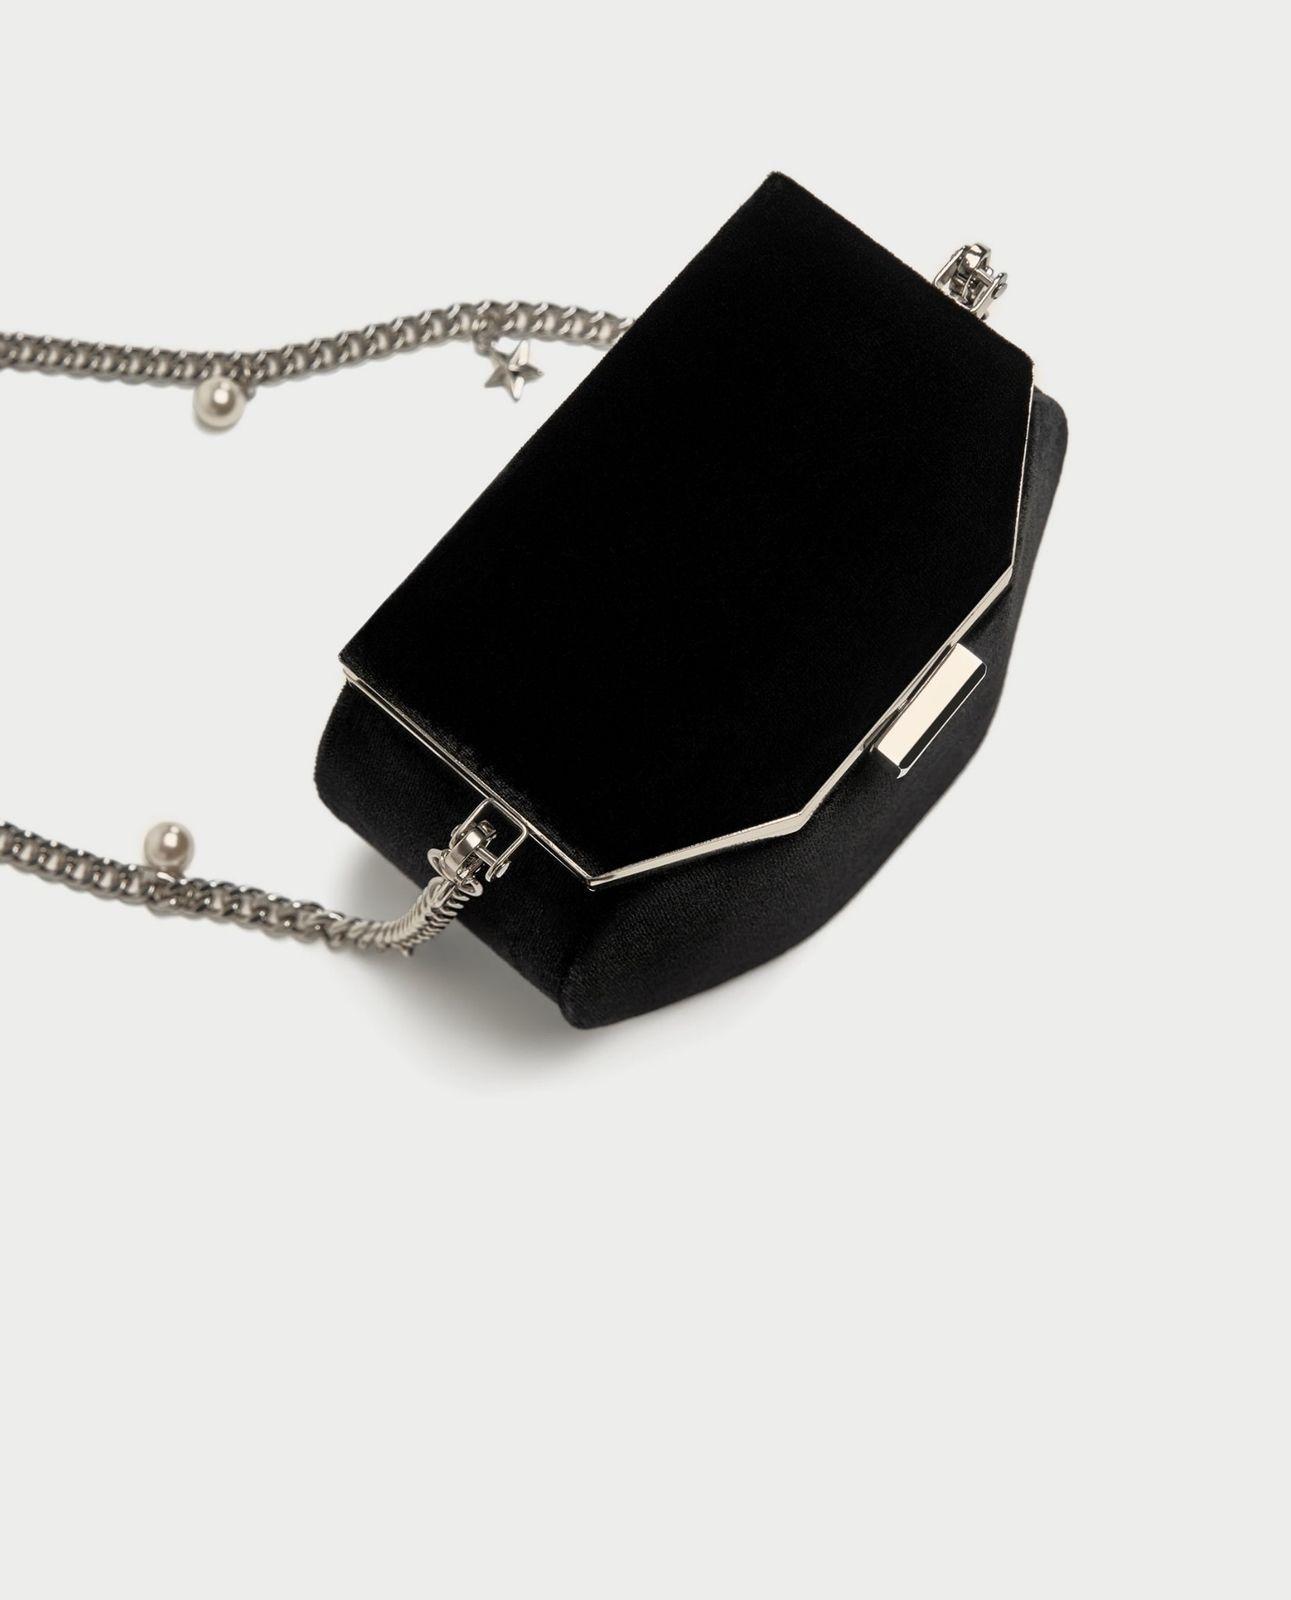 7370e34be04 BNWT ZARA Black Crossbody Bag With Clasp And Charm Strap REF.8377/204